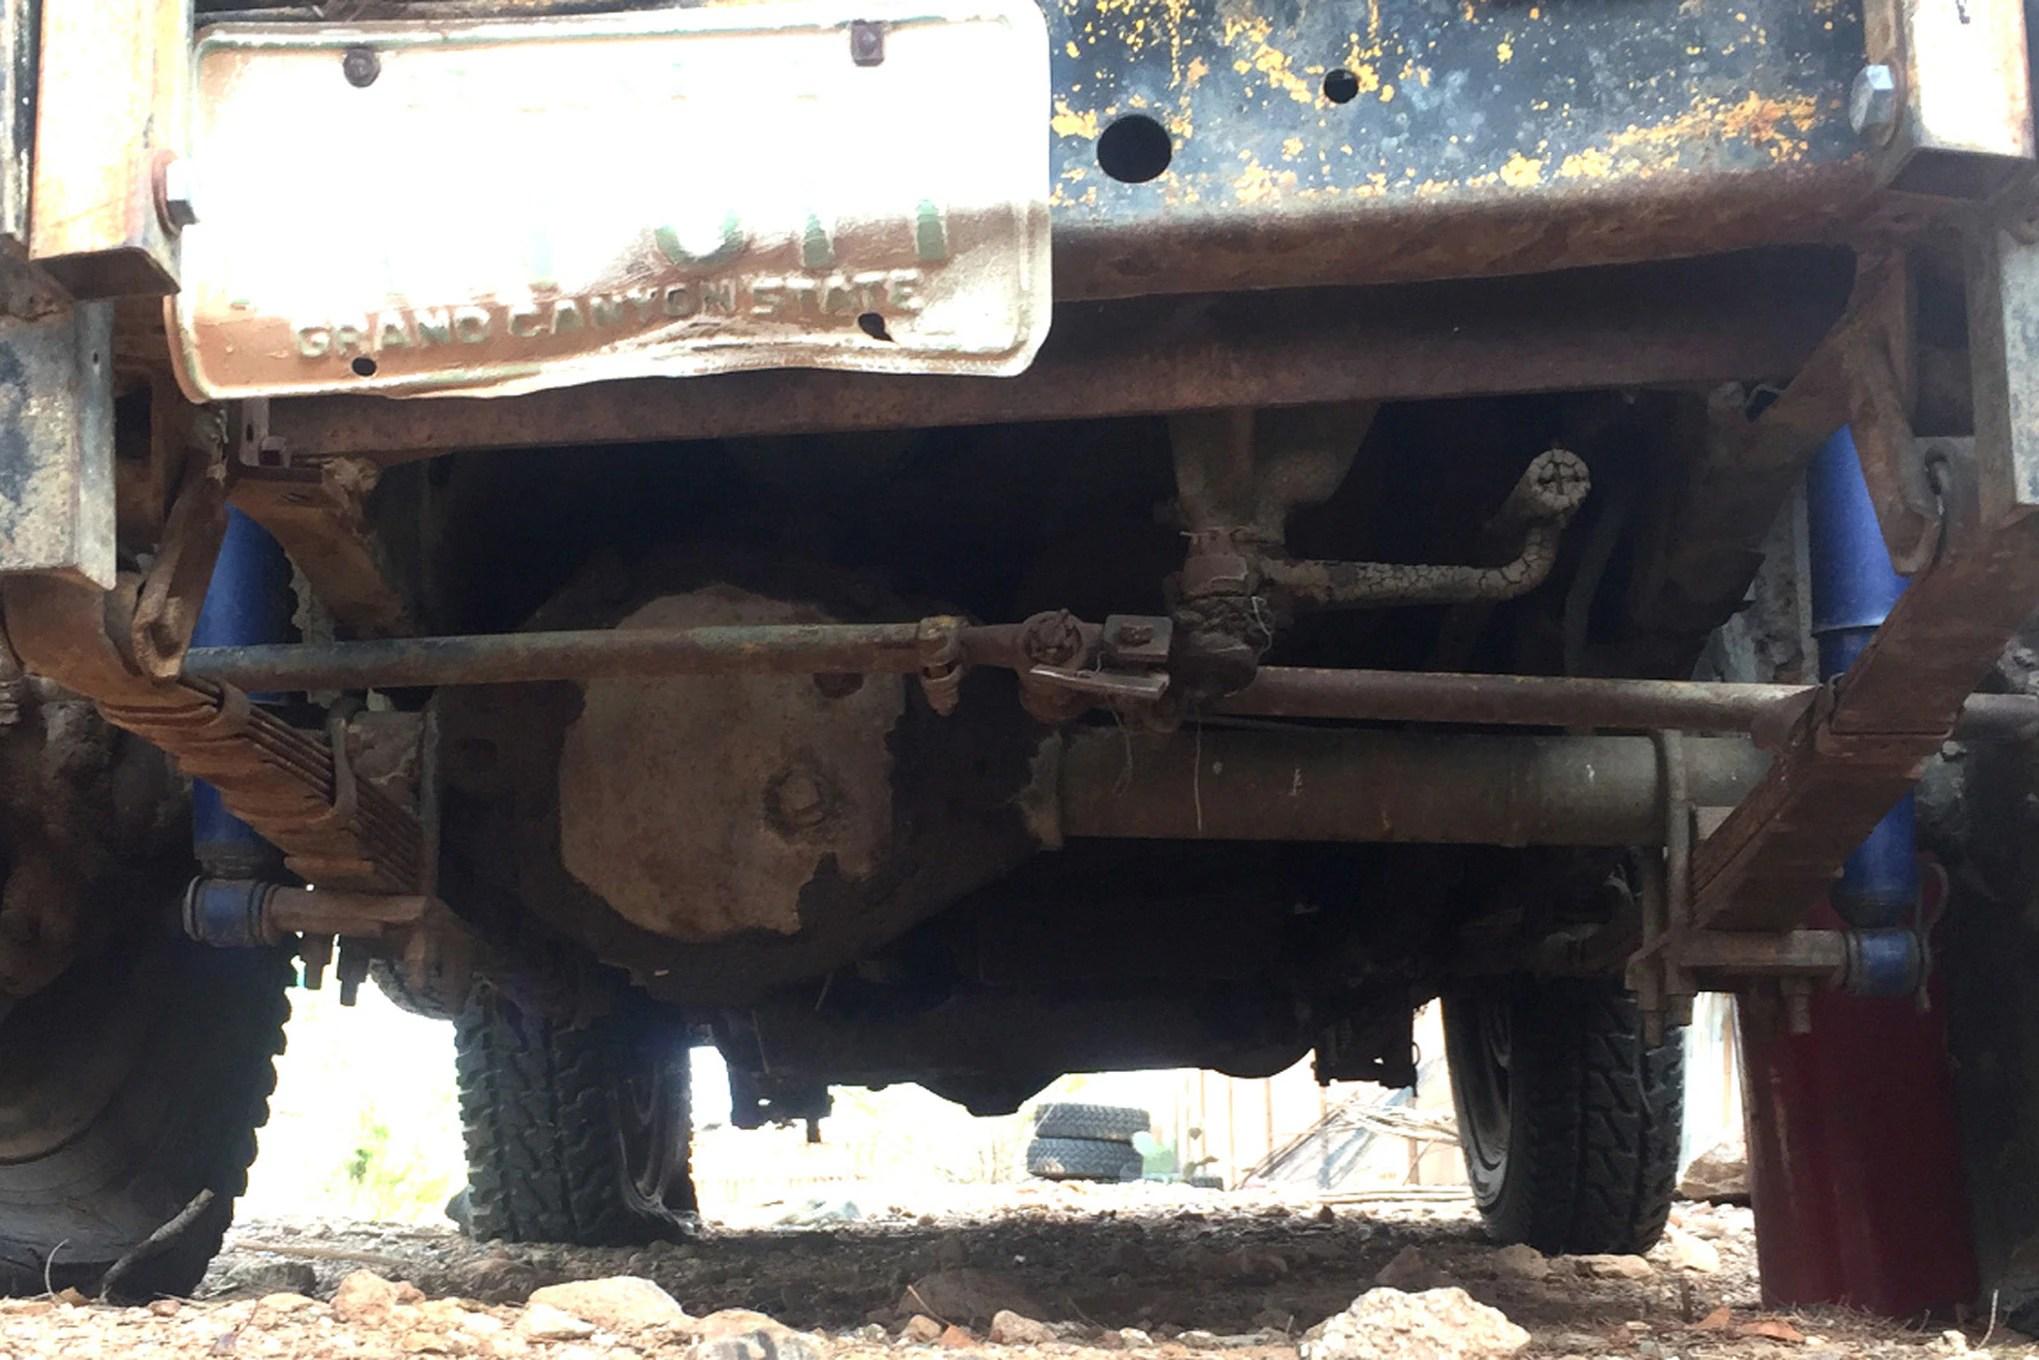 medium resolution of 1973 jeep cj5 powersteering lead 02 1973 jeep cj5 powersteering bellcrank steering